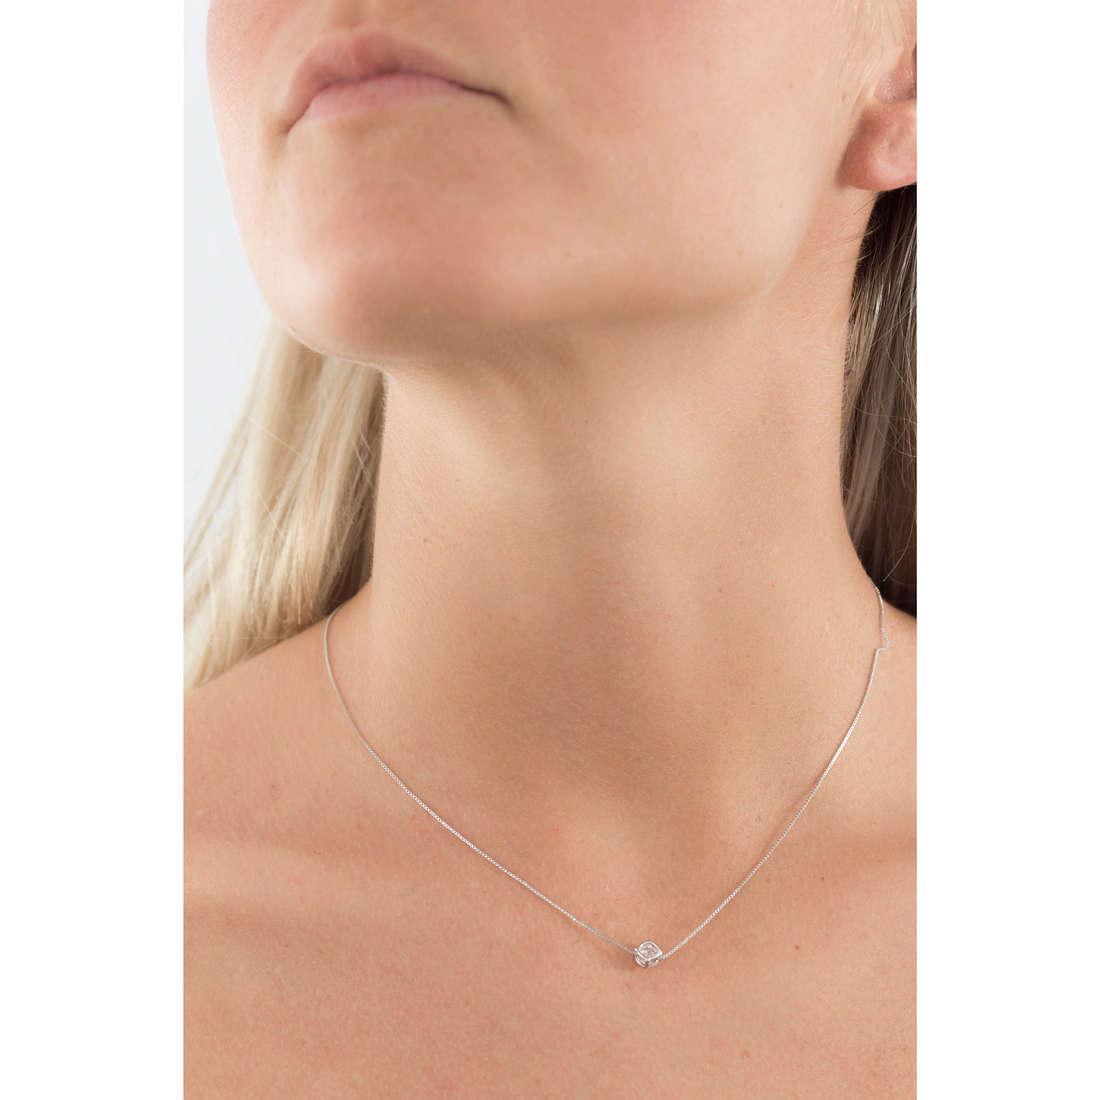 GioiaPura colliers femme 27621-01-00 indosso